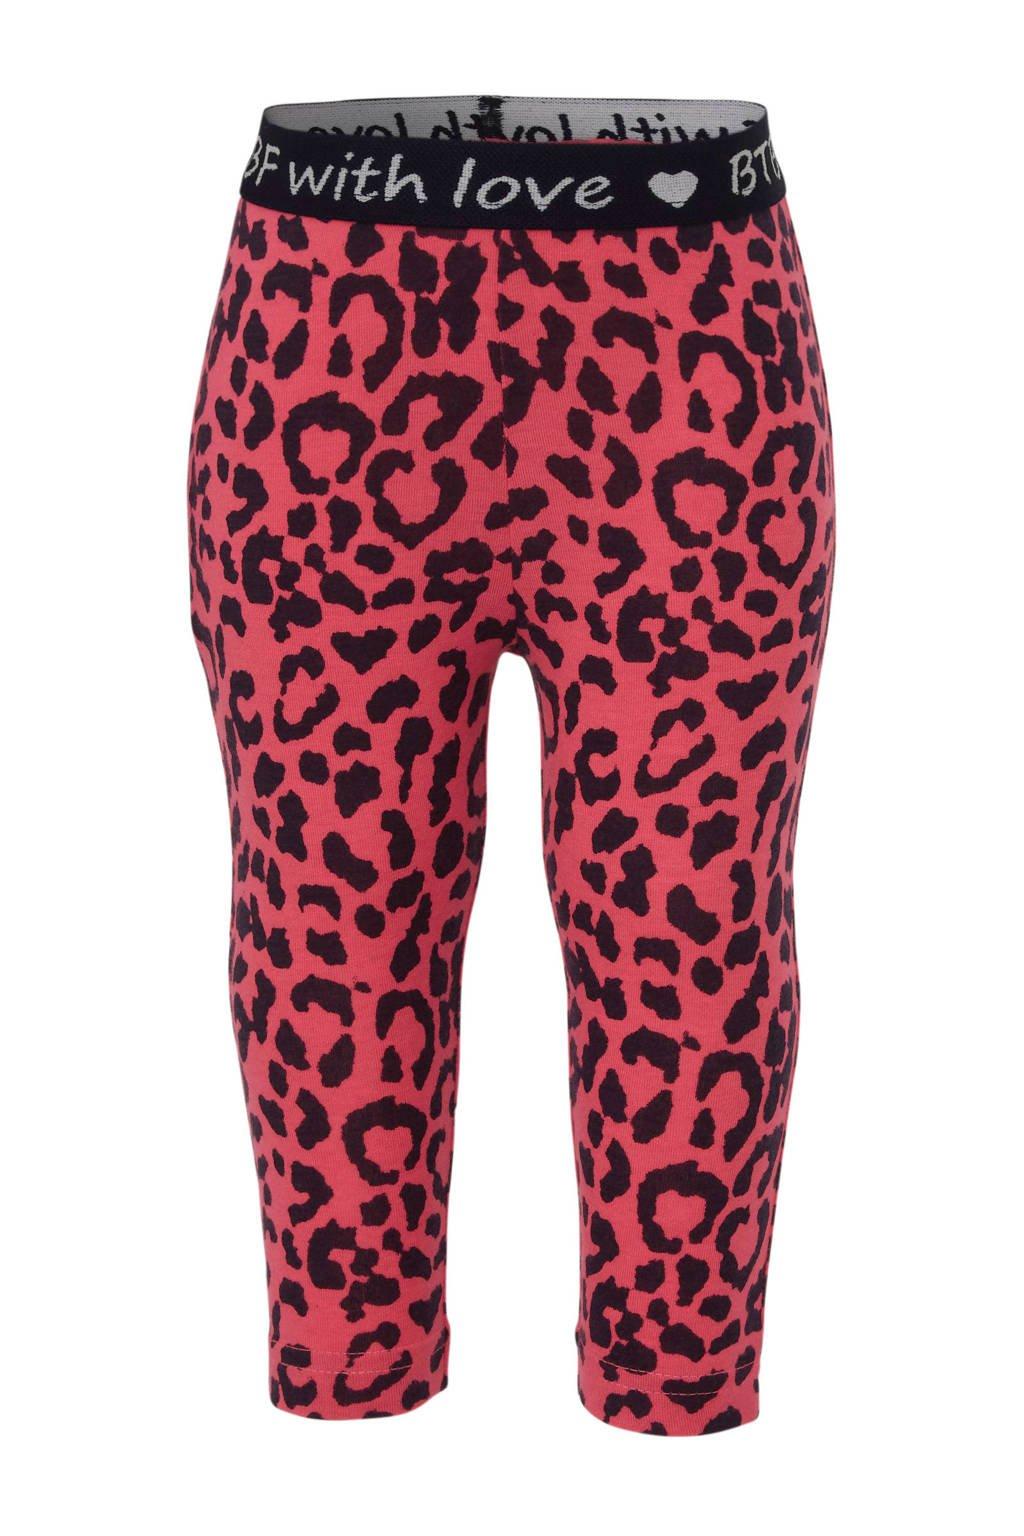 born to be famous. legging met panterprint roze/ zwart